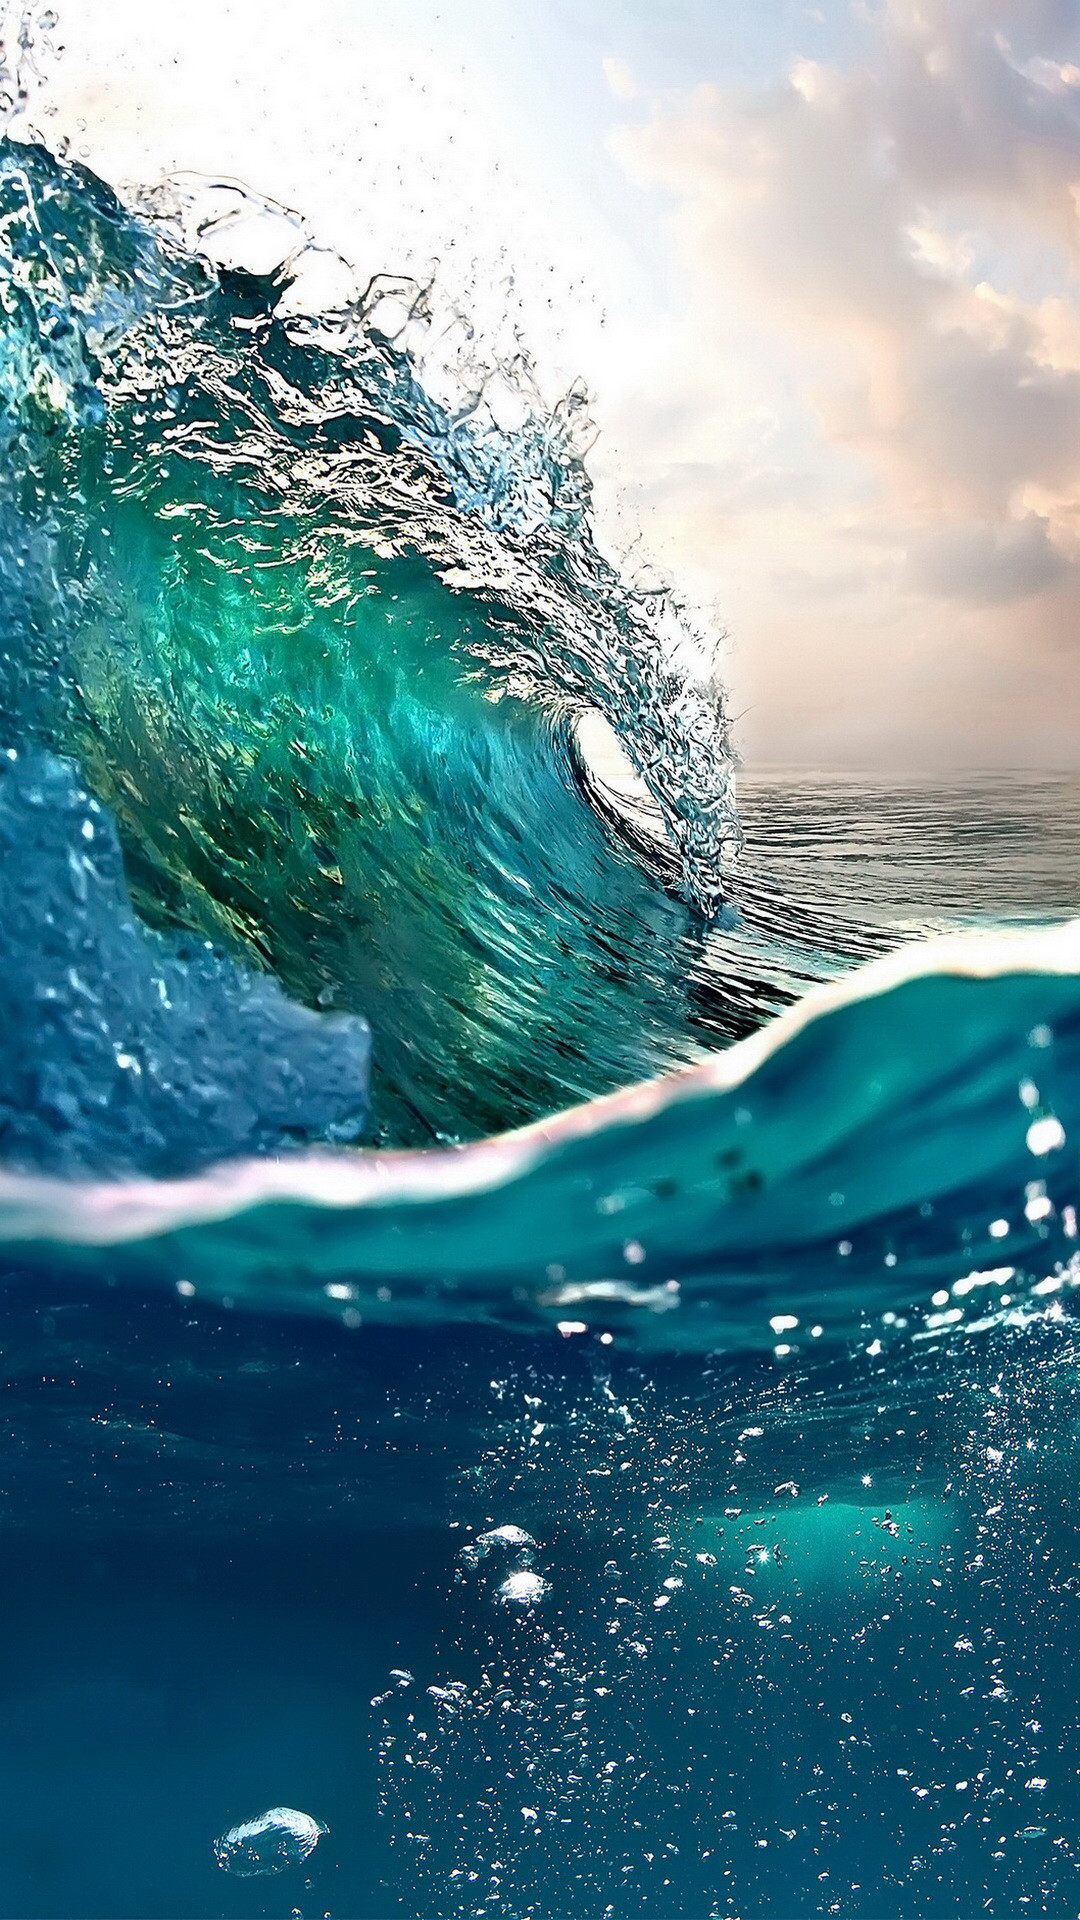 Beautiful deep blues and aqua ocean wave.